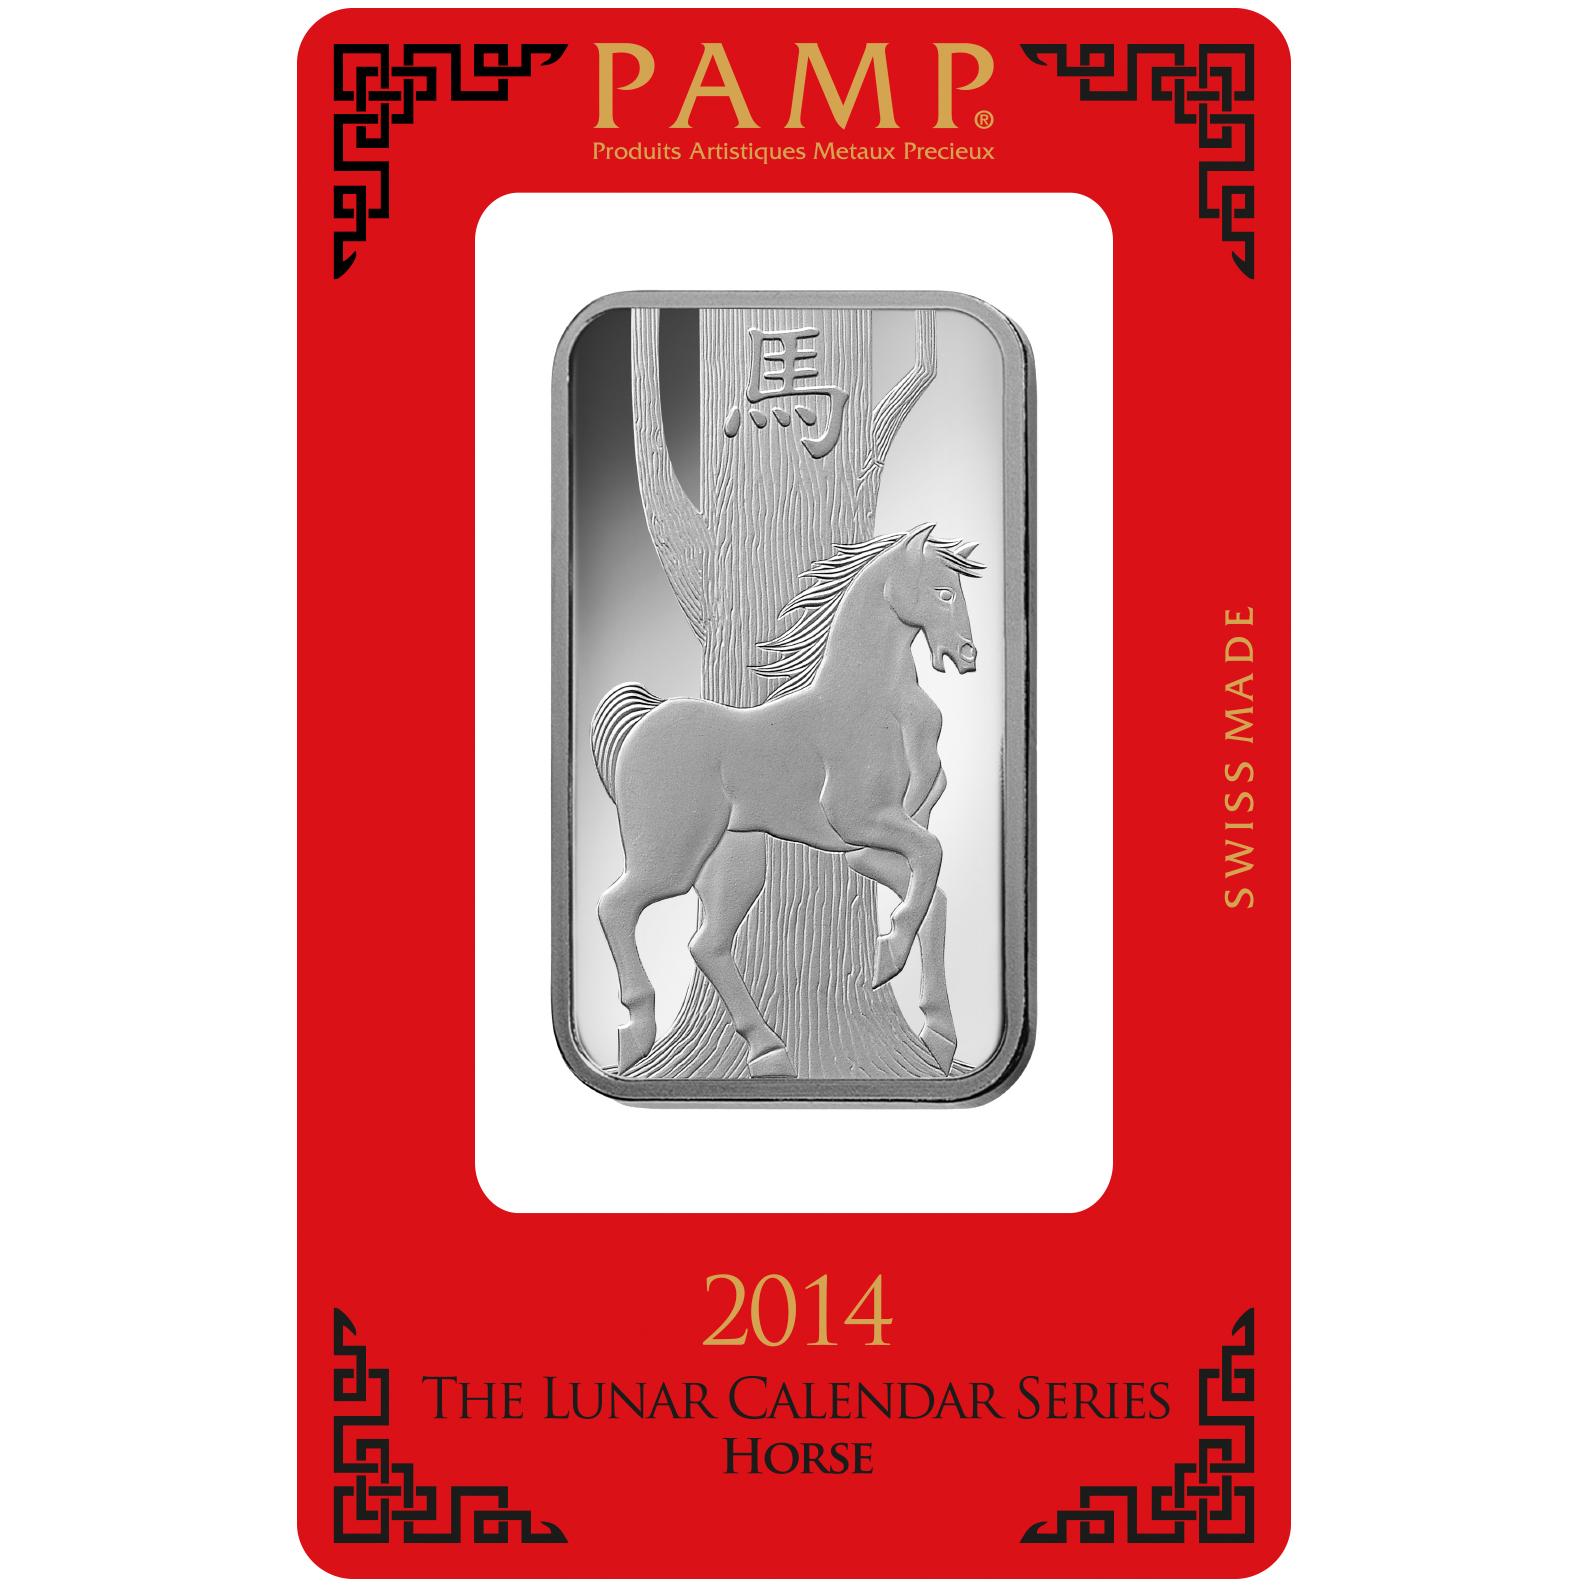 1 oncia lingottino d'argento - PAMP Suisse Cavallo Lunare